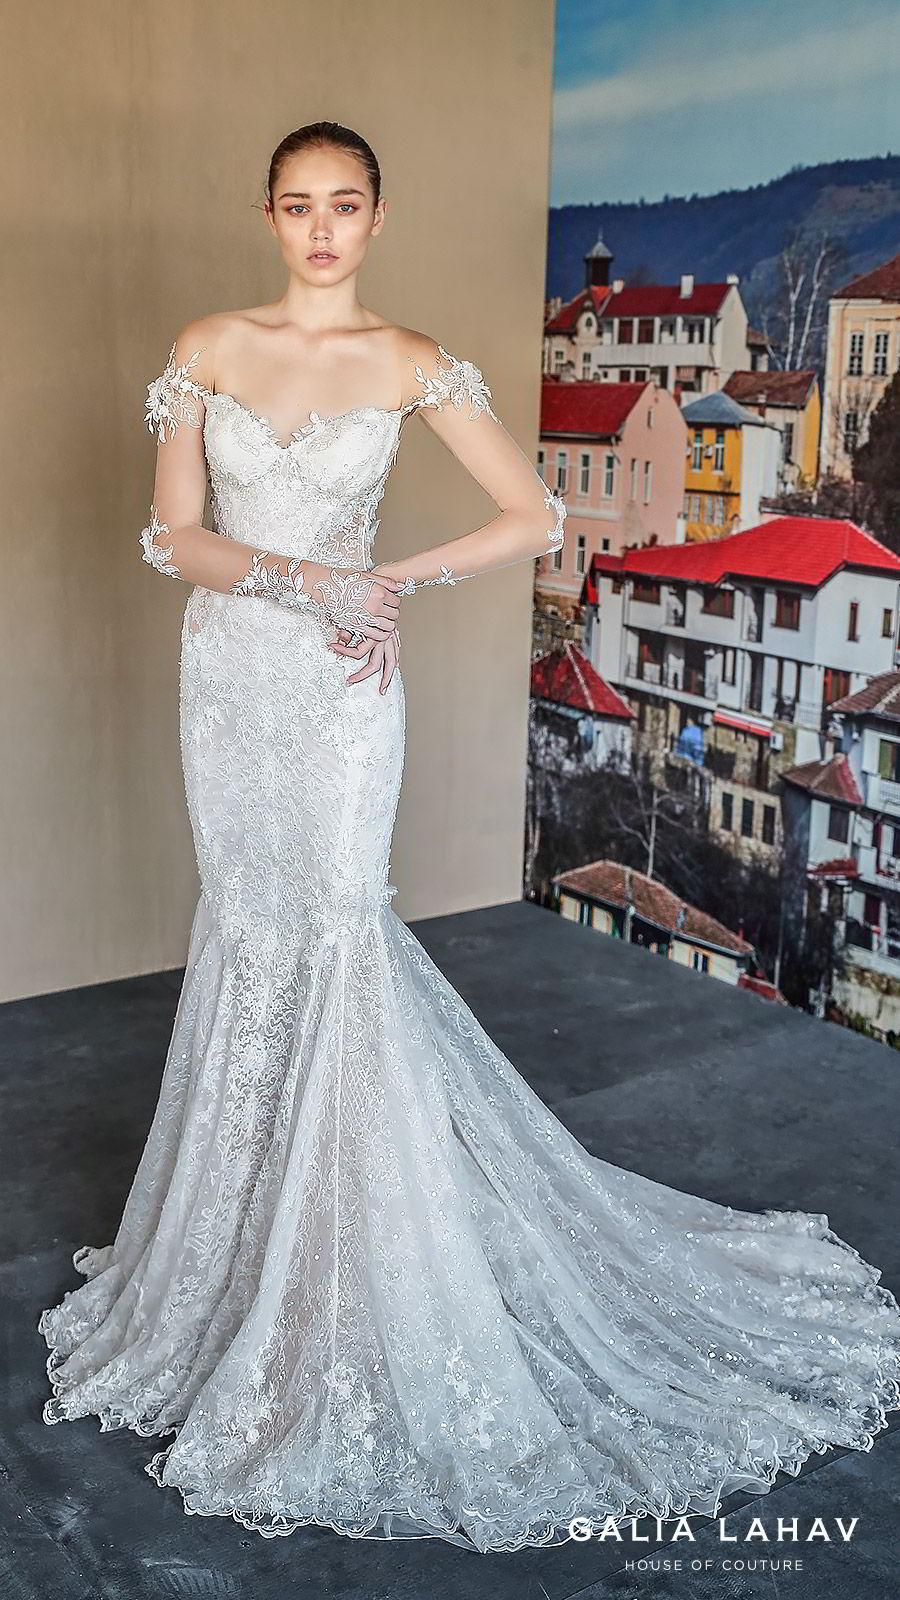 galia lahav fall 2019 bridal illusion long sleeves sweetheart neckline fit flare heavily embellished mermaid lace wedding dress chapel train elegant romantic (nissa) mv